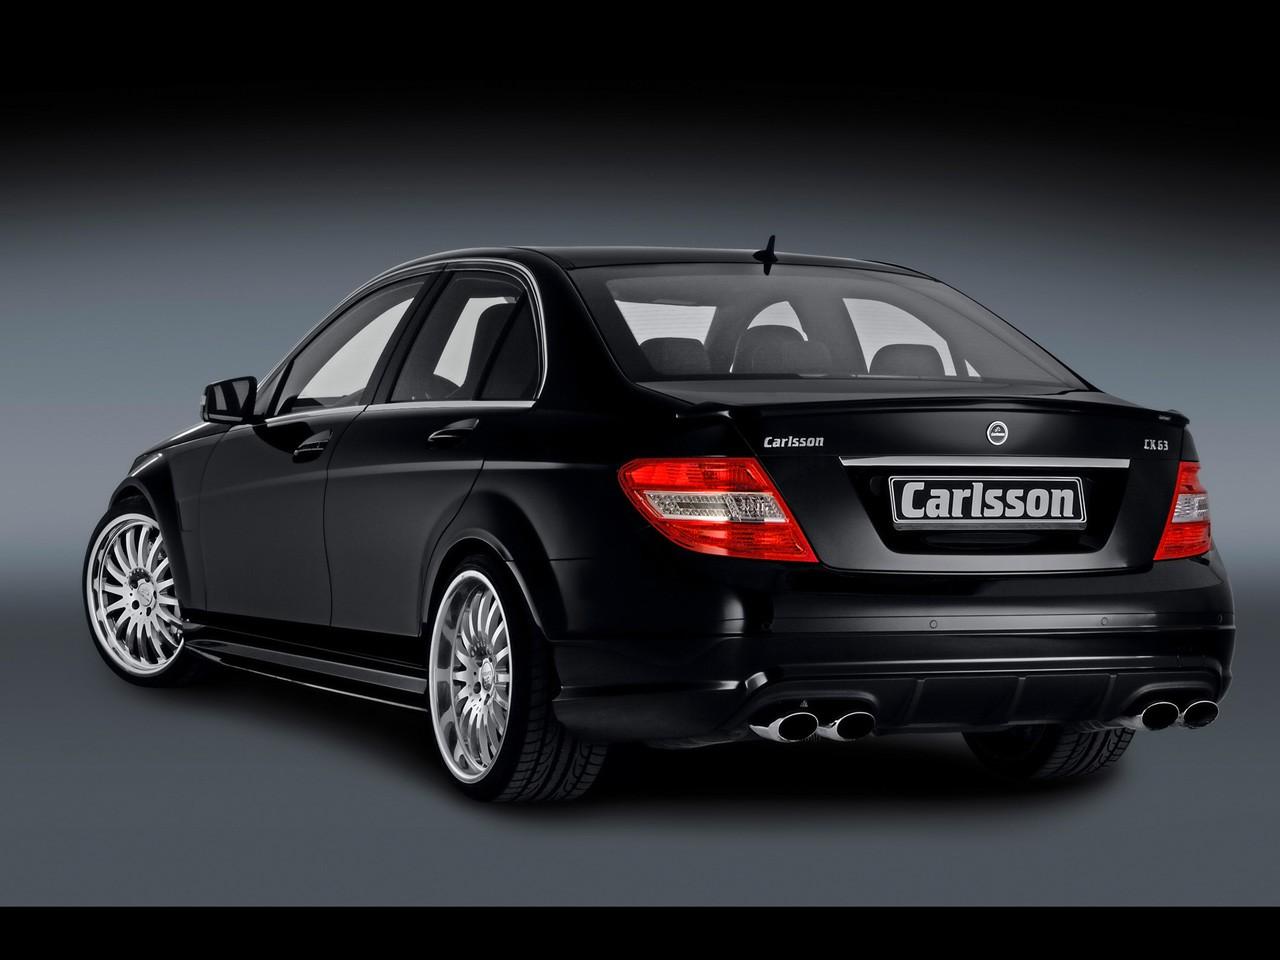 2009 Carlsson Mercedes CK63 S